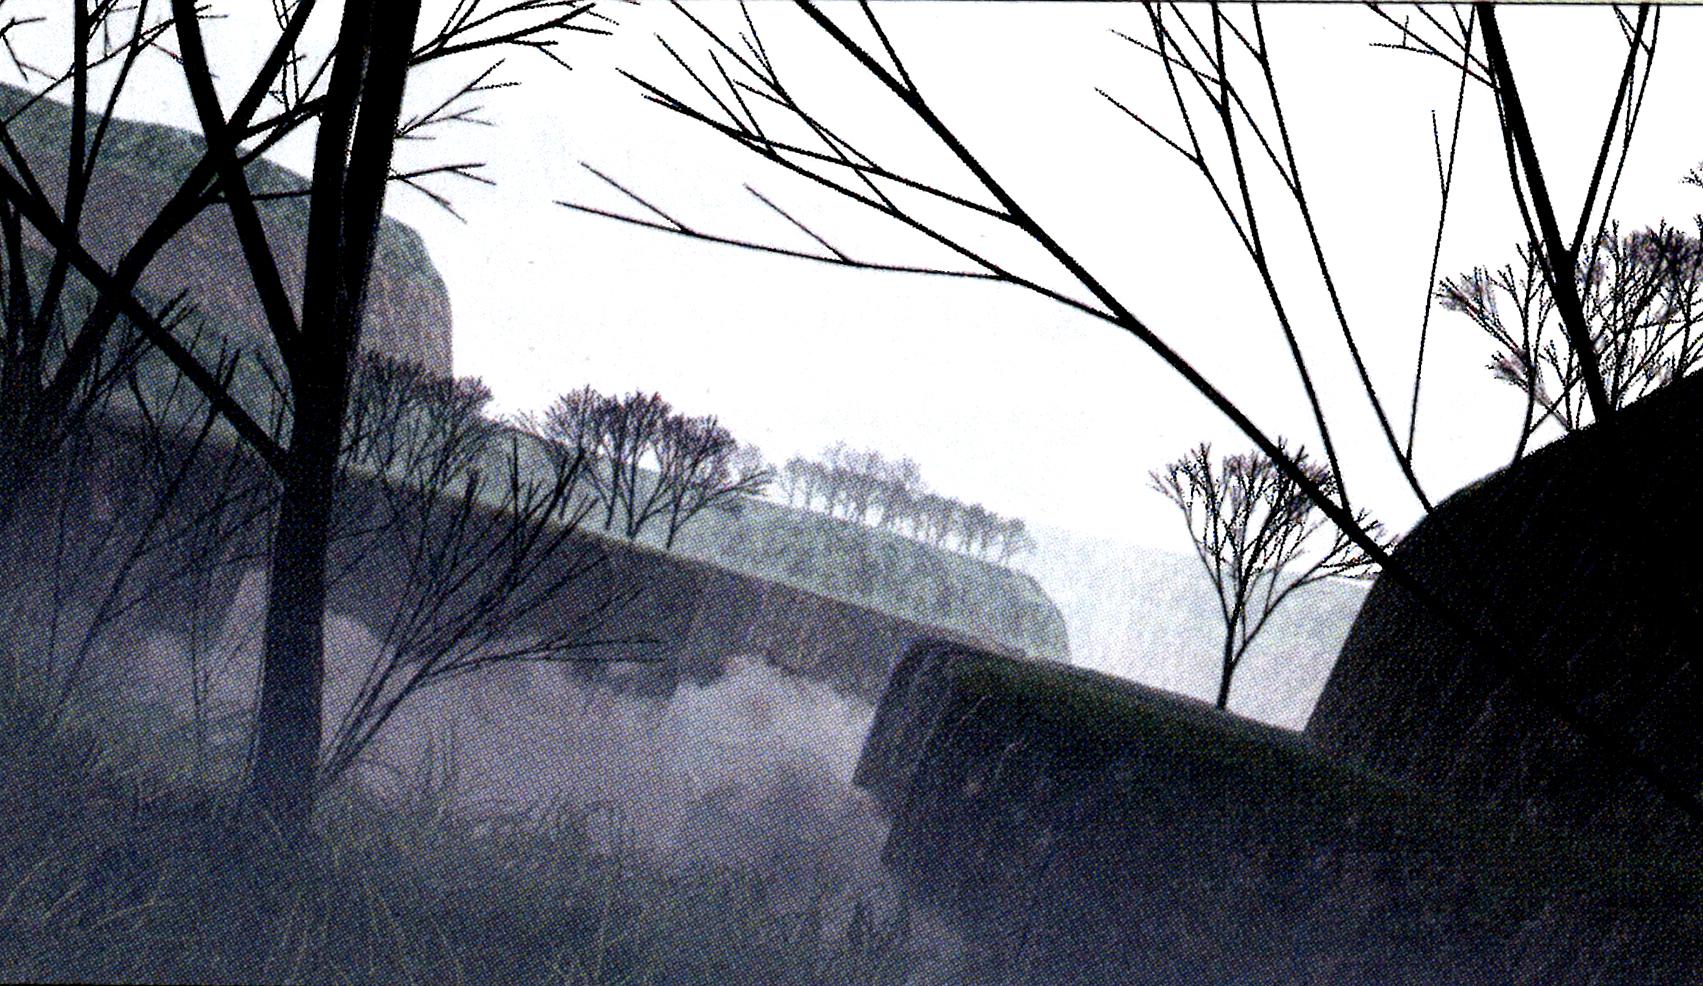 Nebel Valley